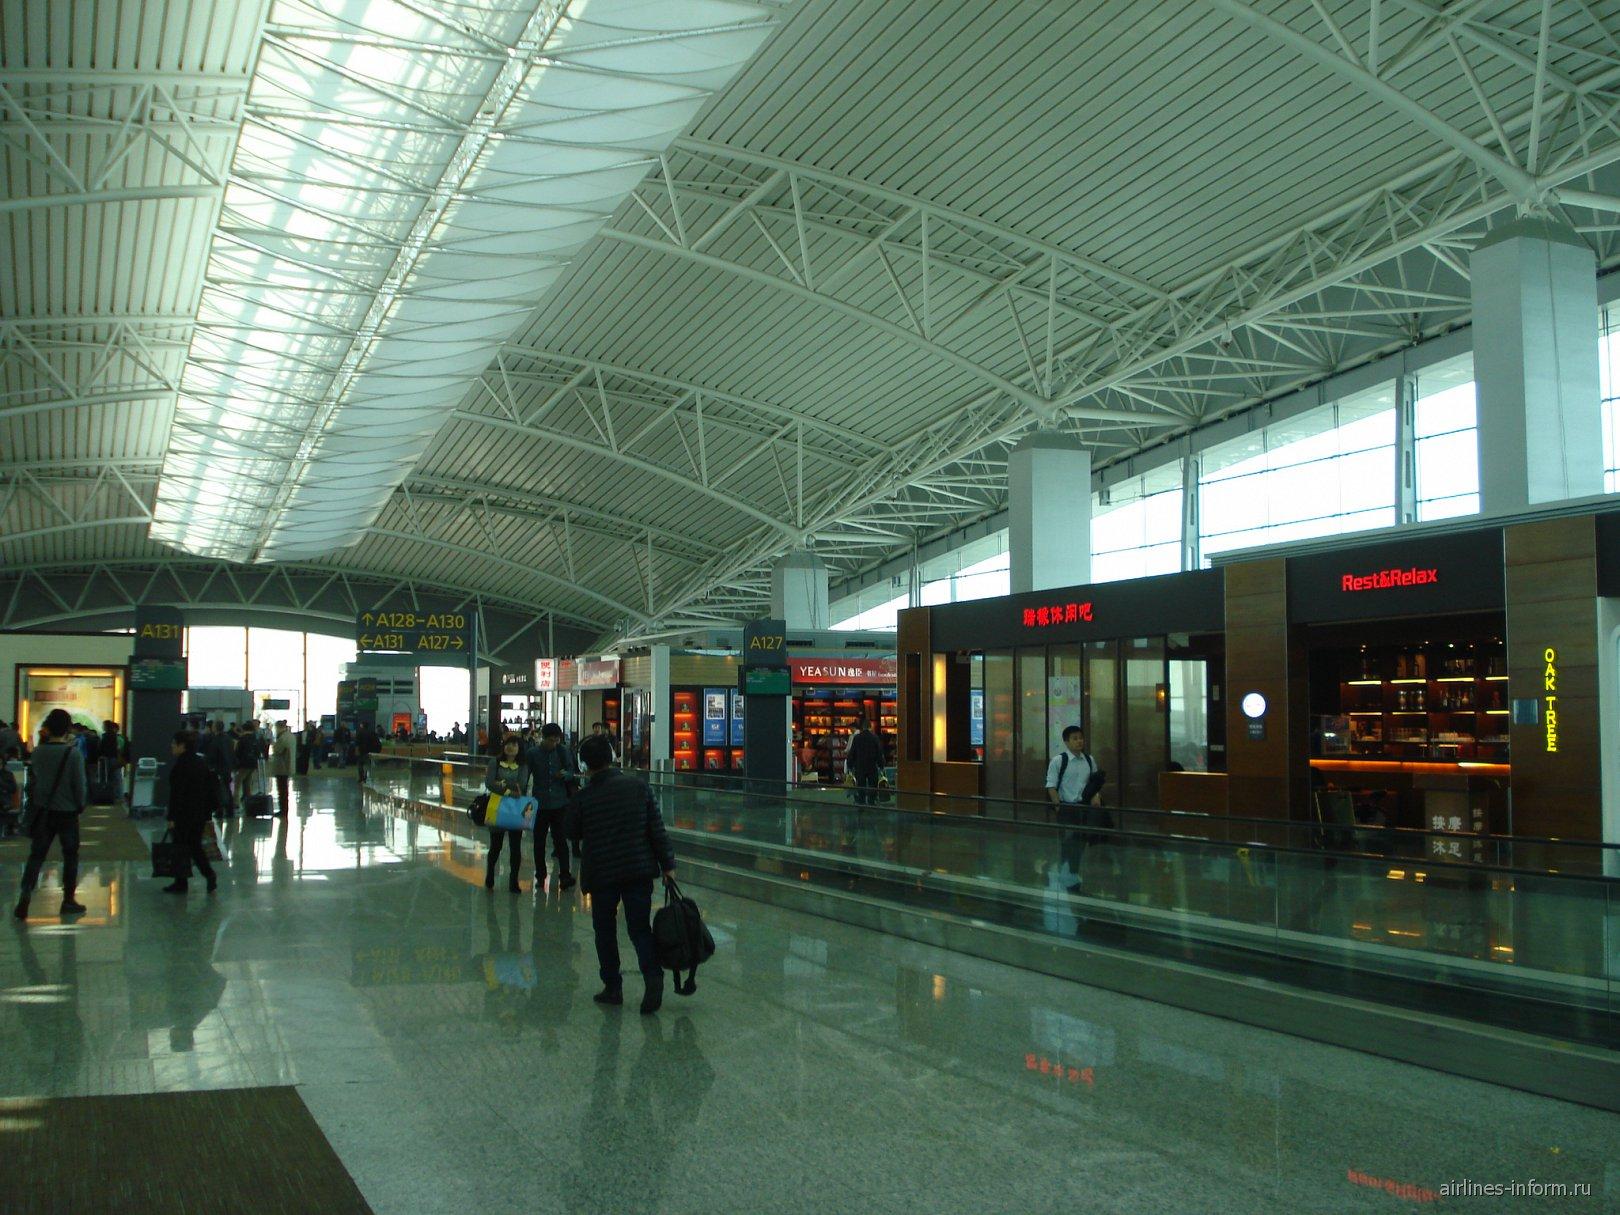 В аэровокзале аэропорта Байюнь в Гуанчжоу